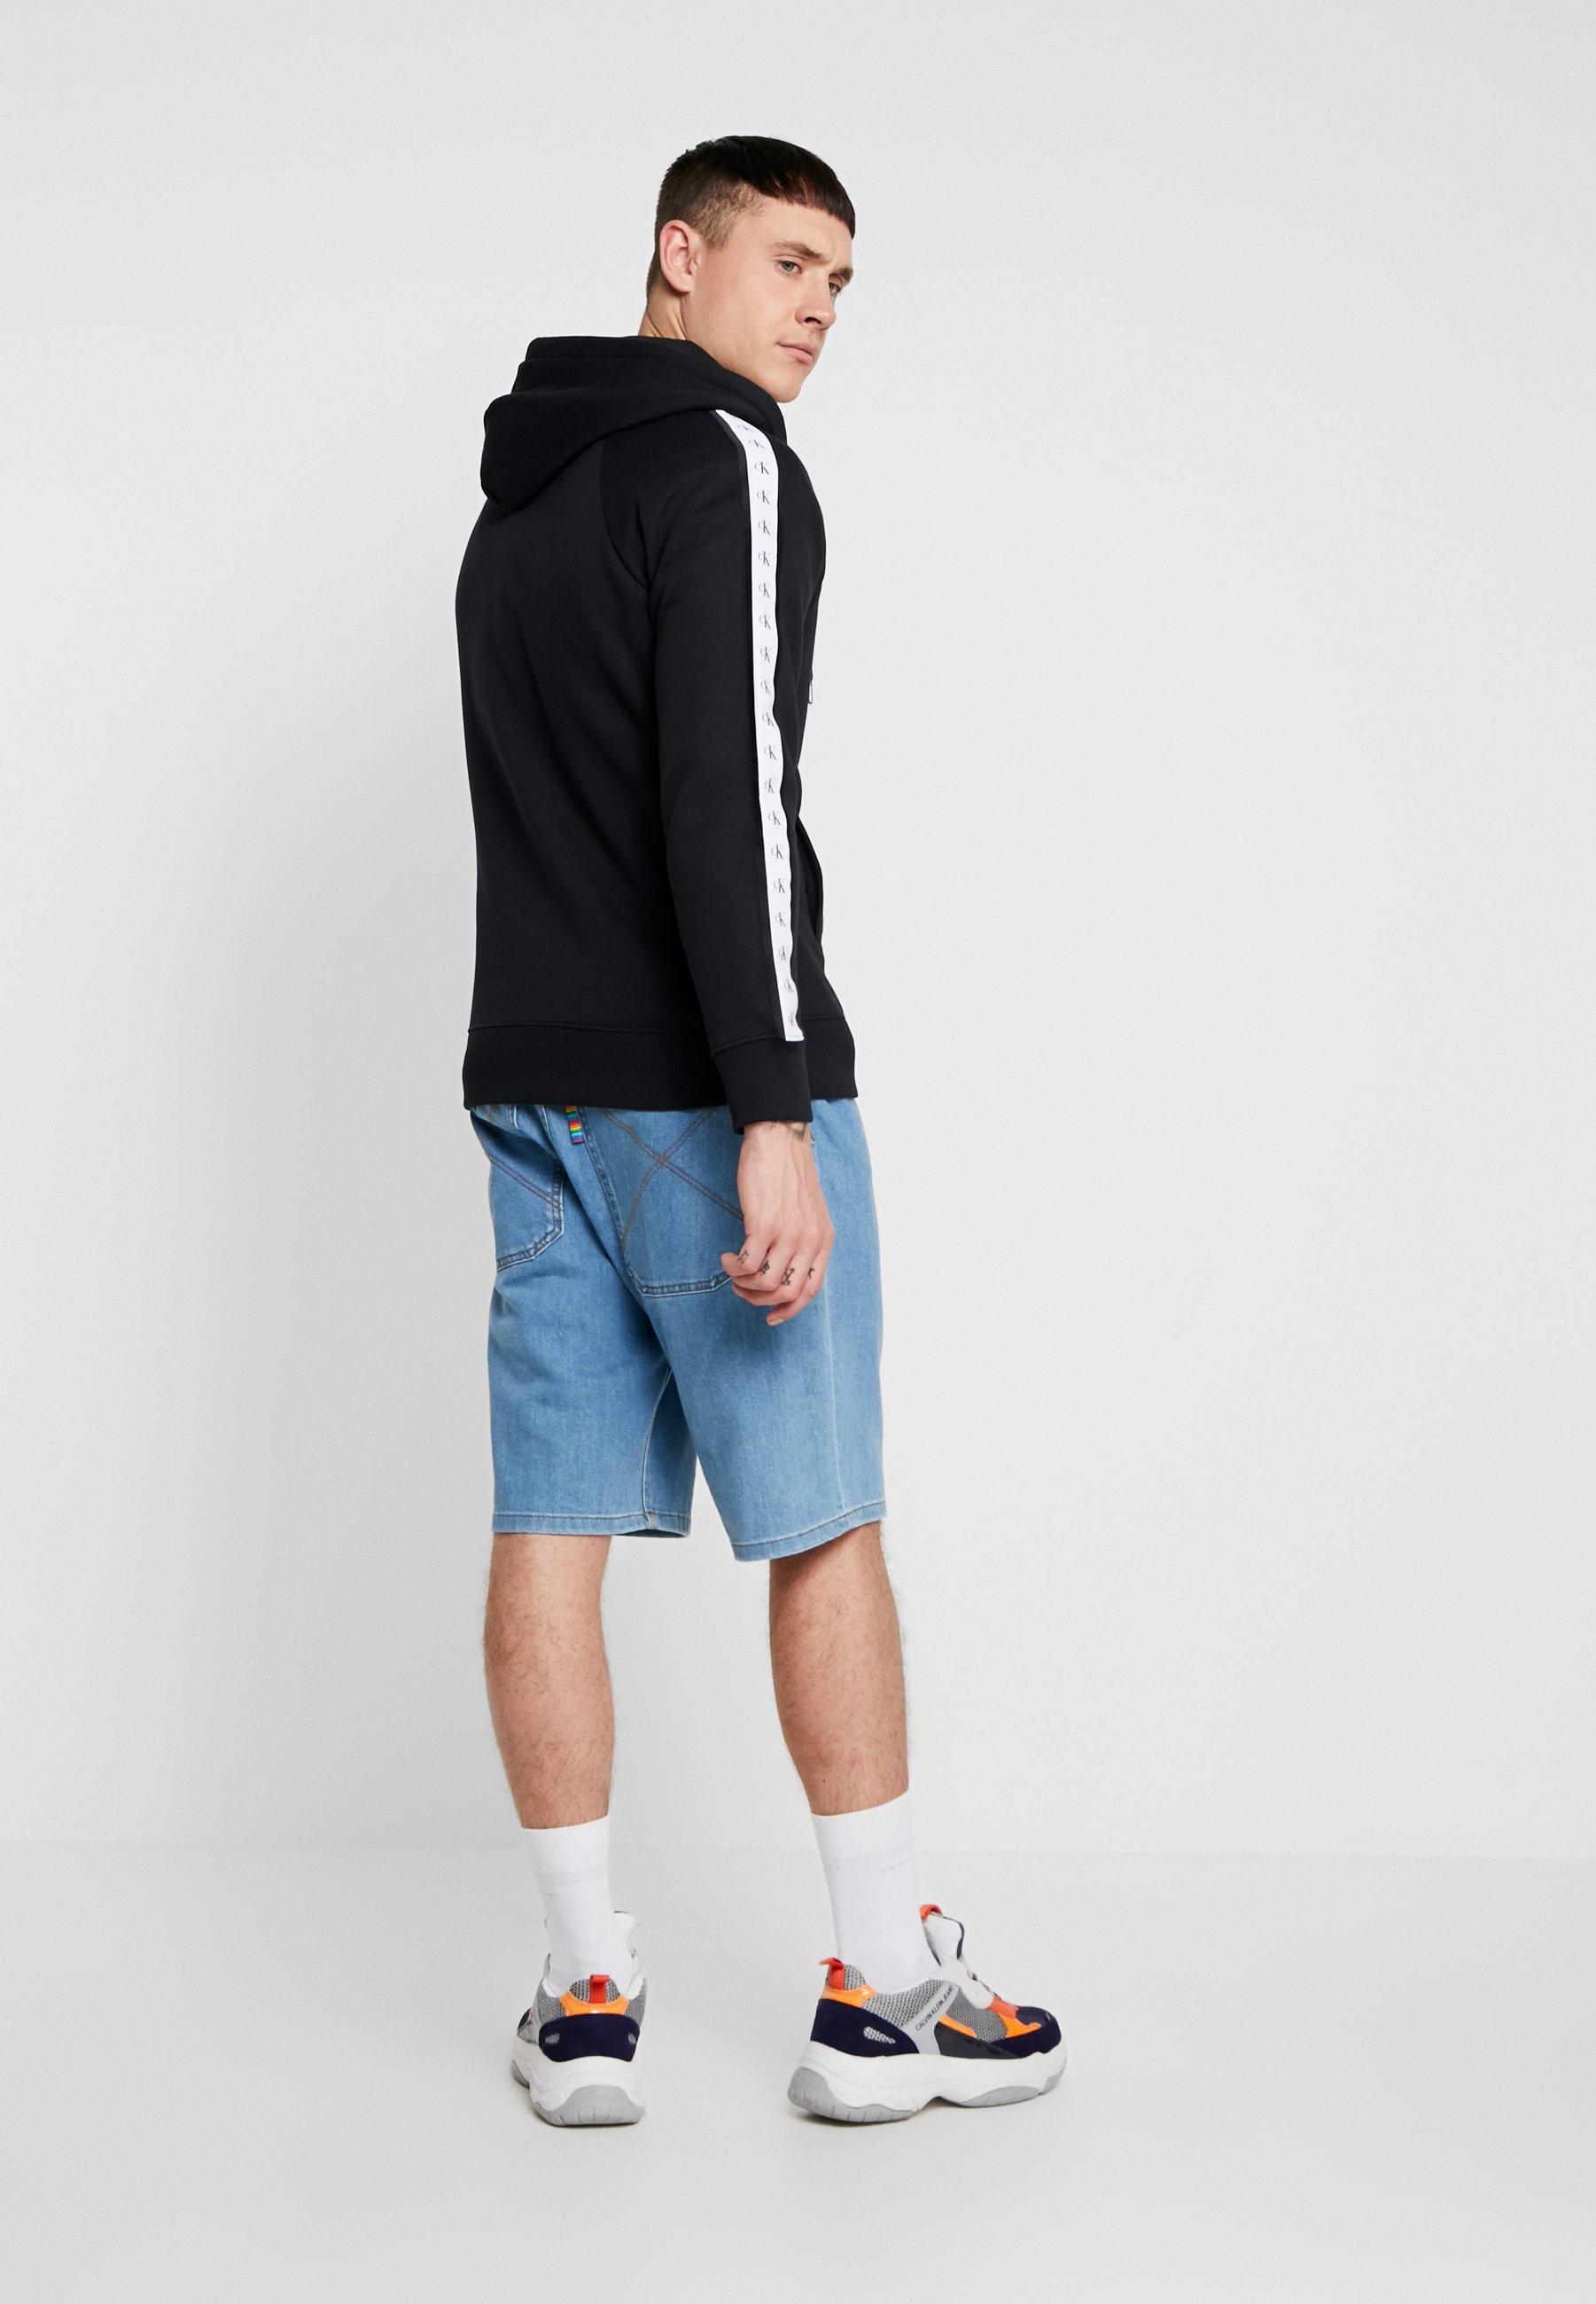 Tape Calvin Black Jeans Monogram En Zip Klein ThroughVeste Sweat Zippée b6fY7gy